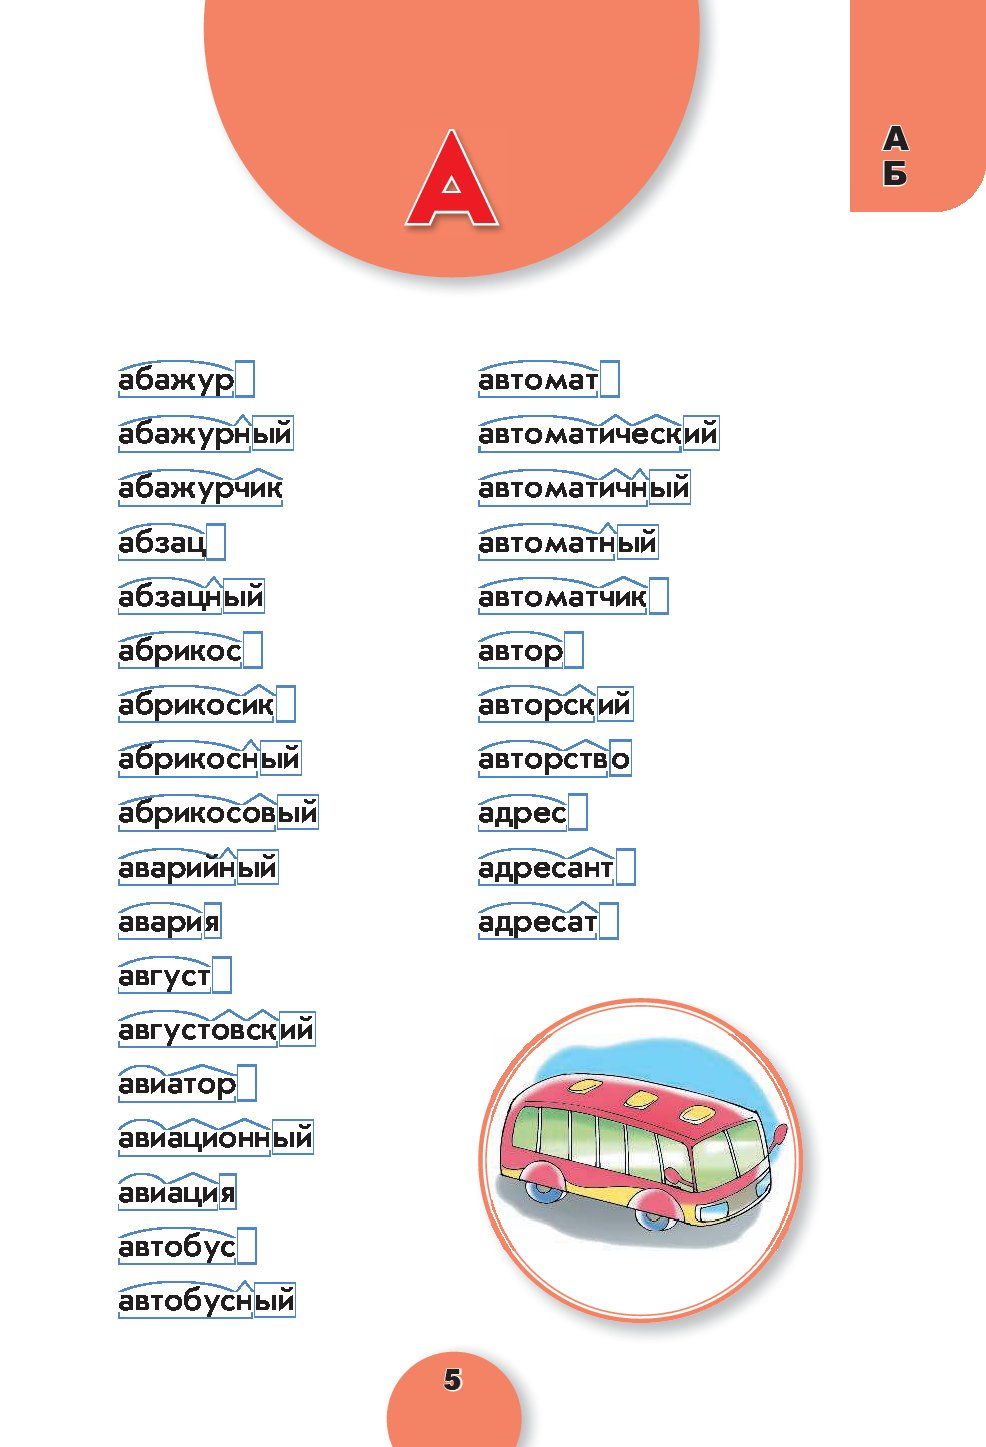 Онлайн казино рулетка шолулар